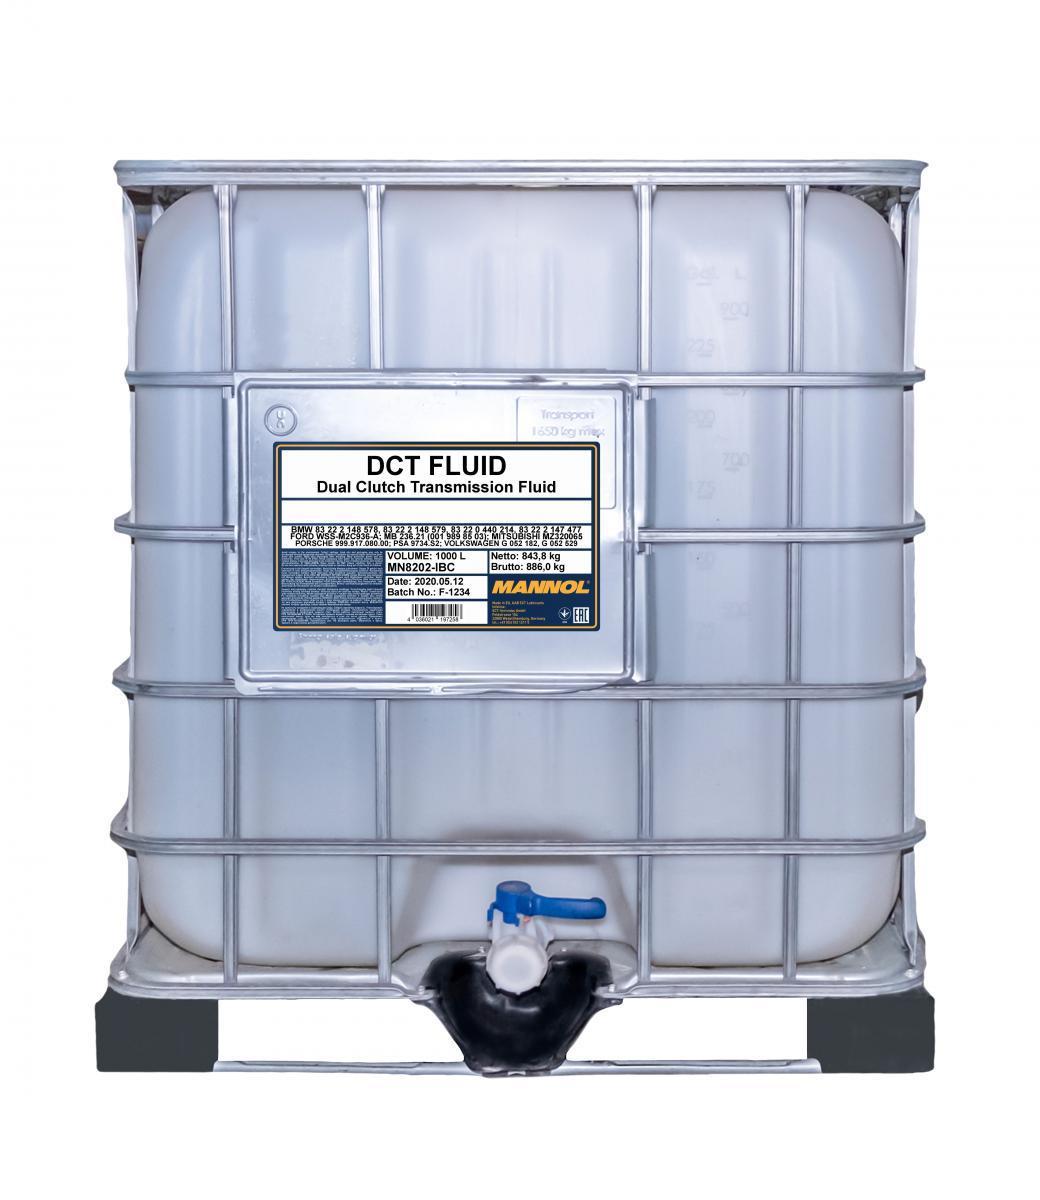 MN8202-IBC MANNOL DCT FLUID Inhalt: 1000l Automatikgetriebeöl MN8202-IBC günstig kaufen